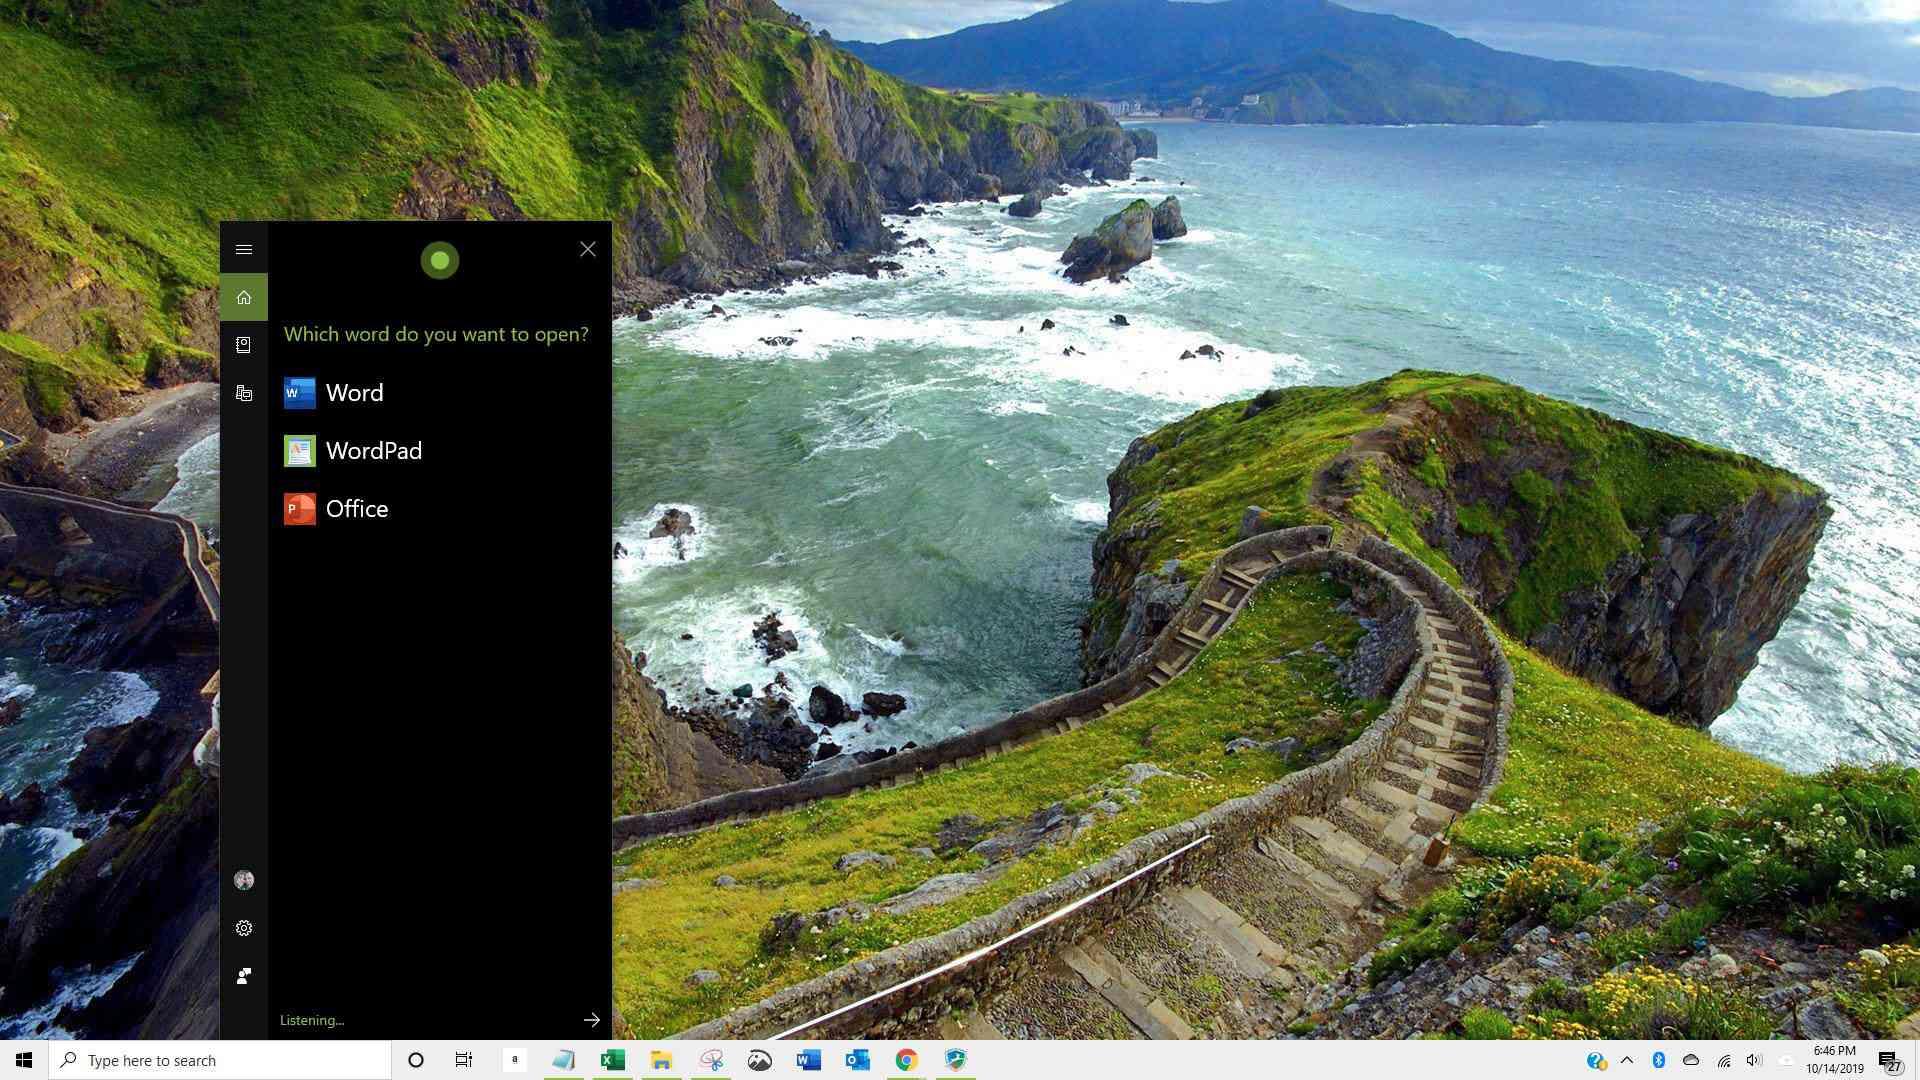 Screenshot of Cortana responding to request to open Word